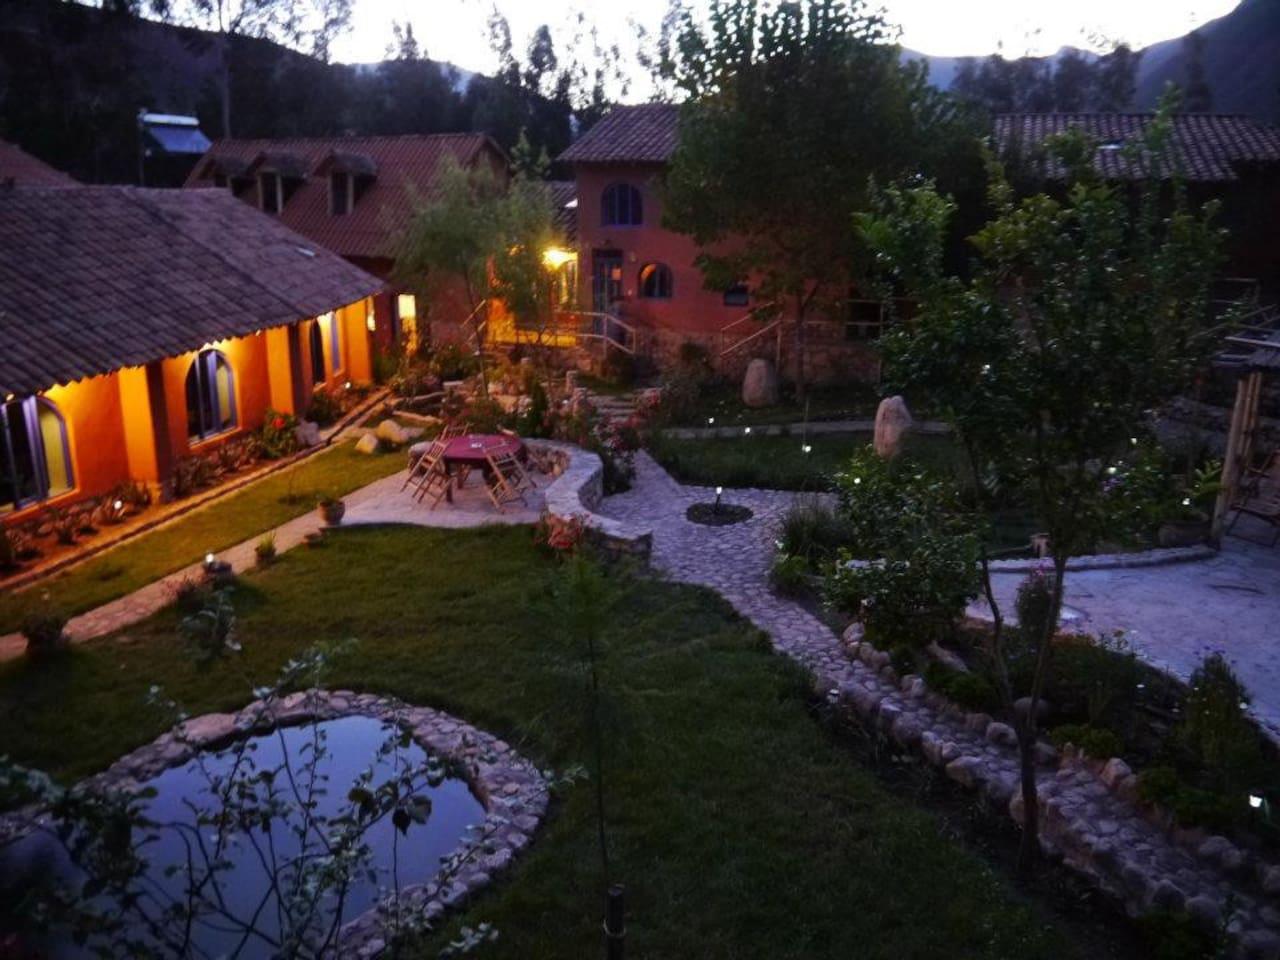 Main view garden